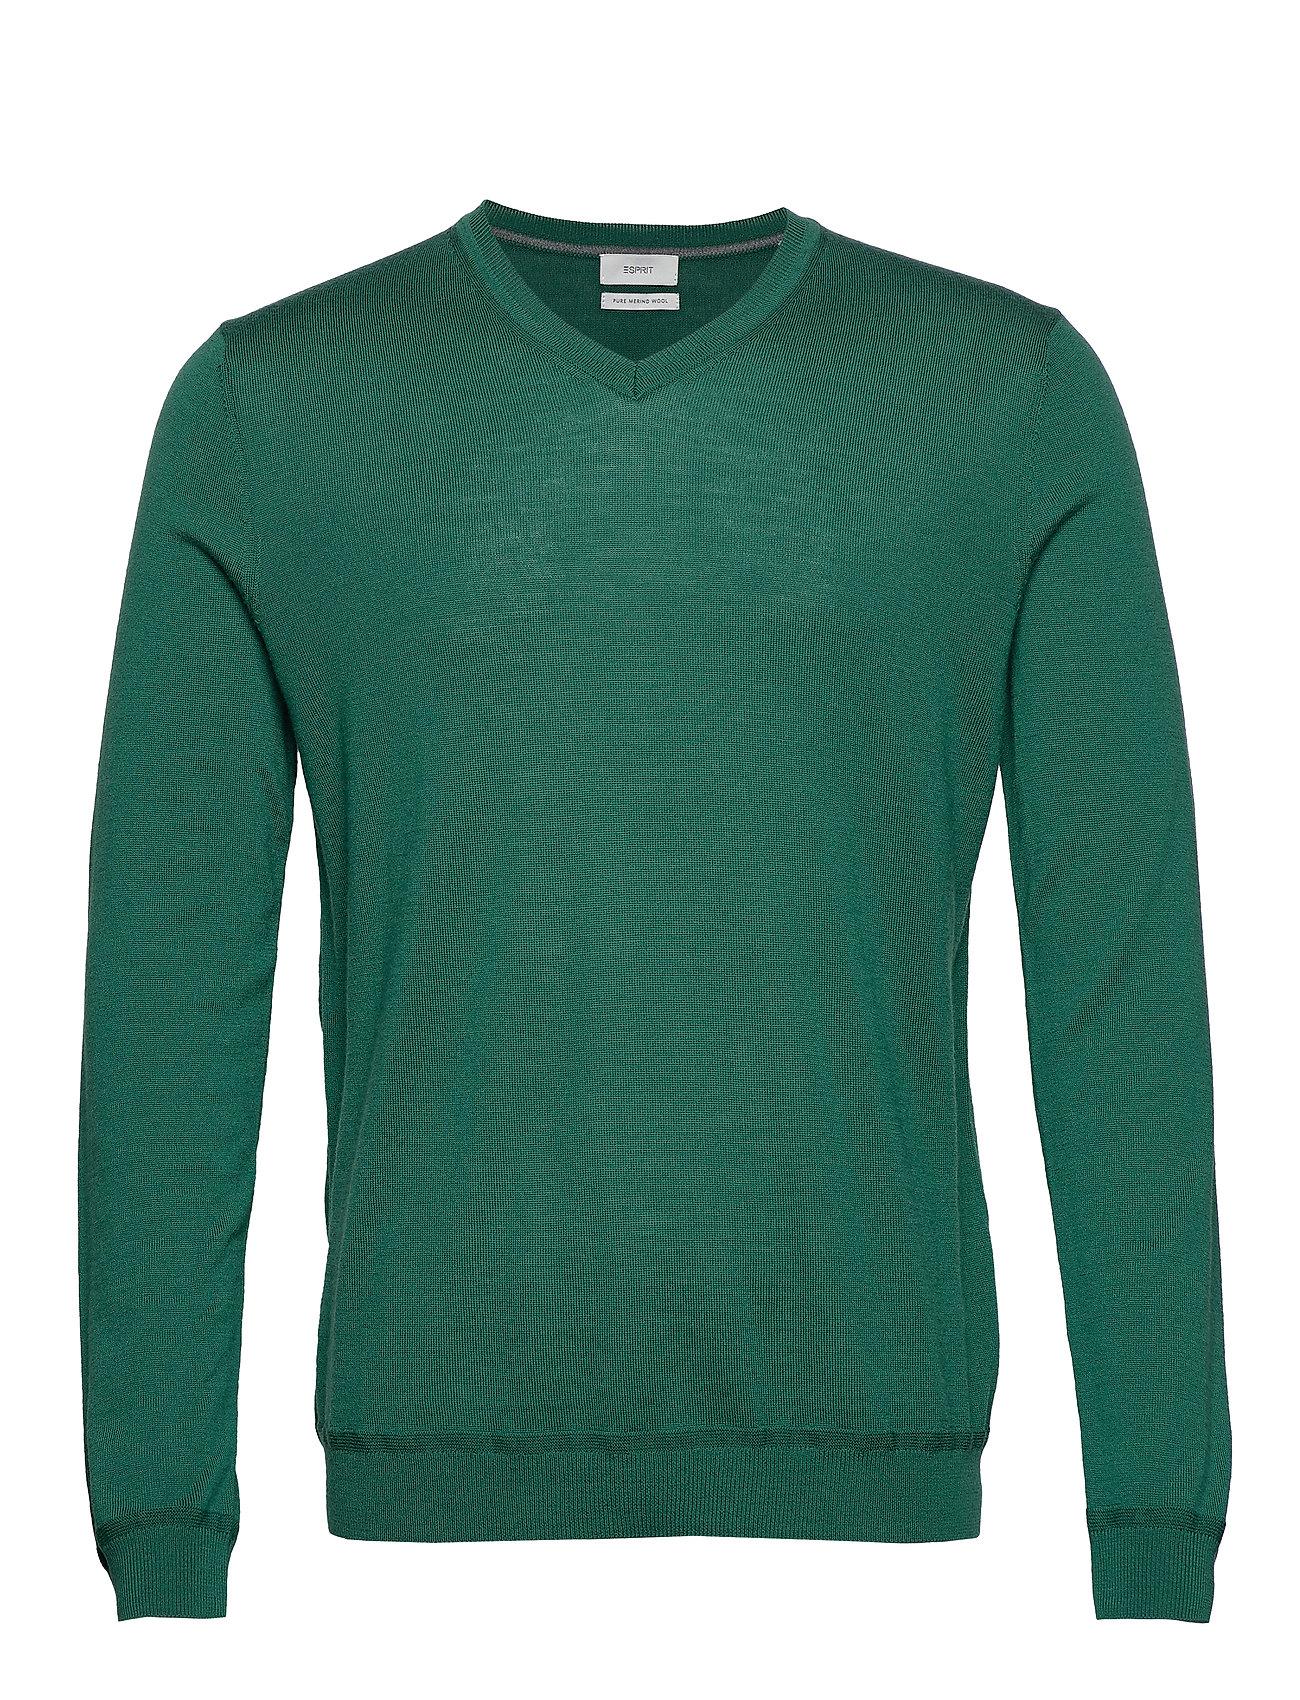 Esprit Casual Sweaters - EMERALD GREEN